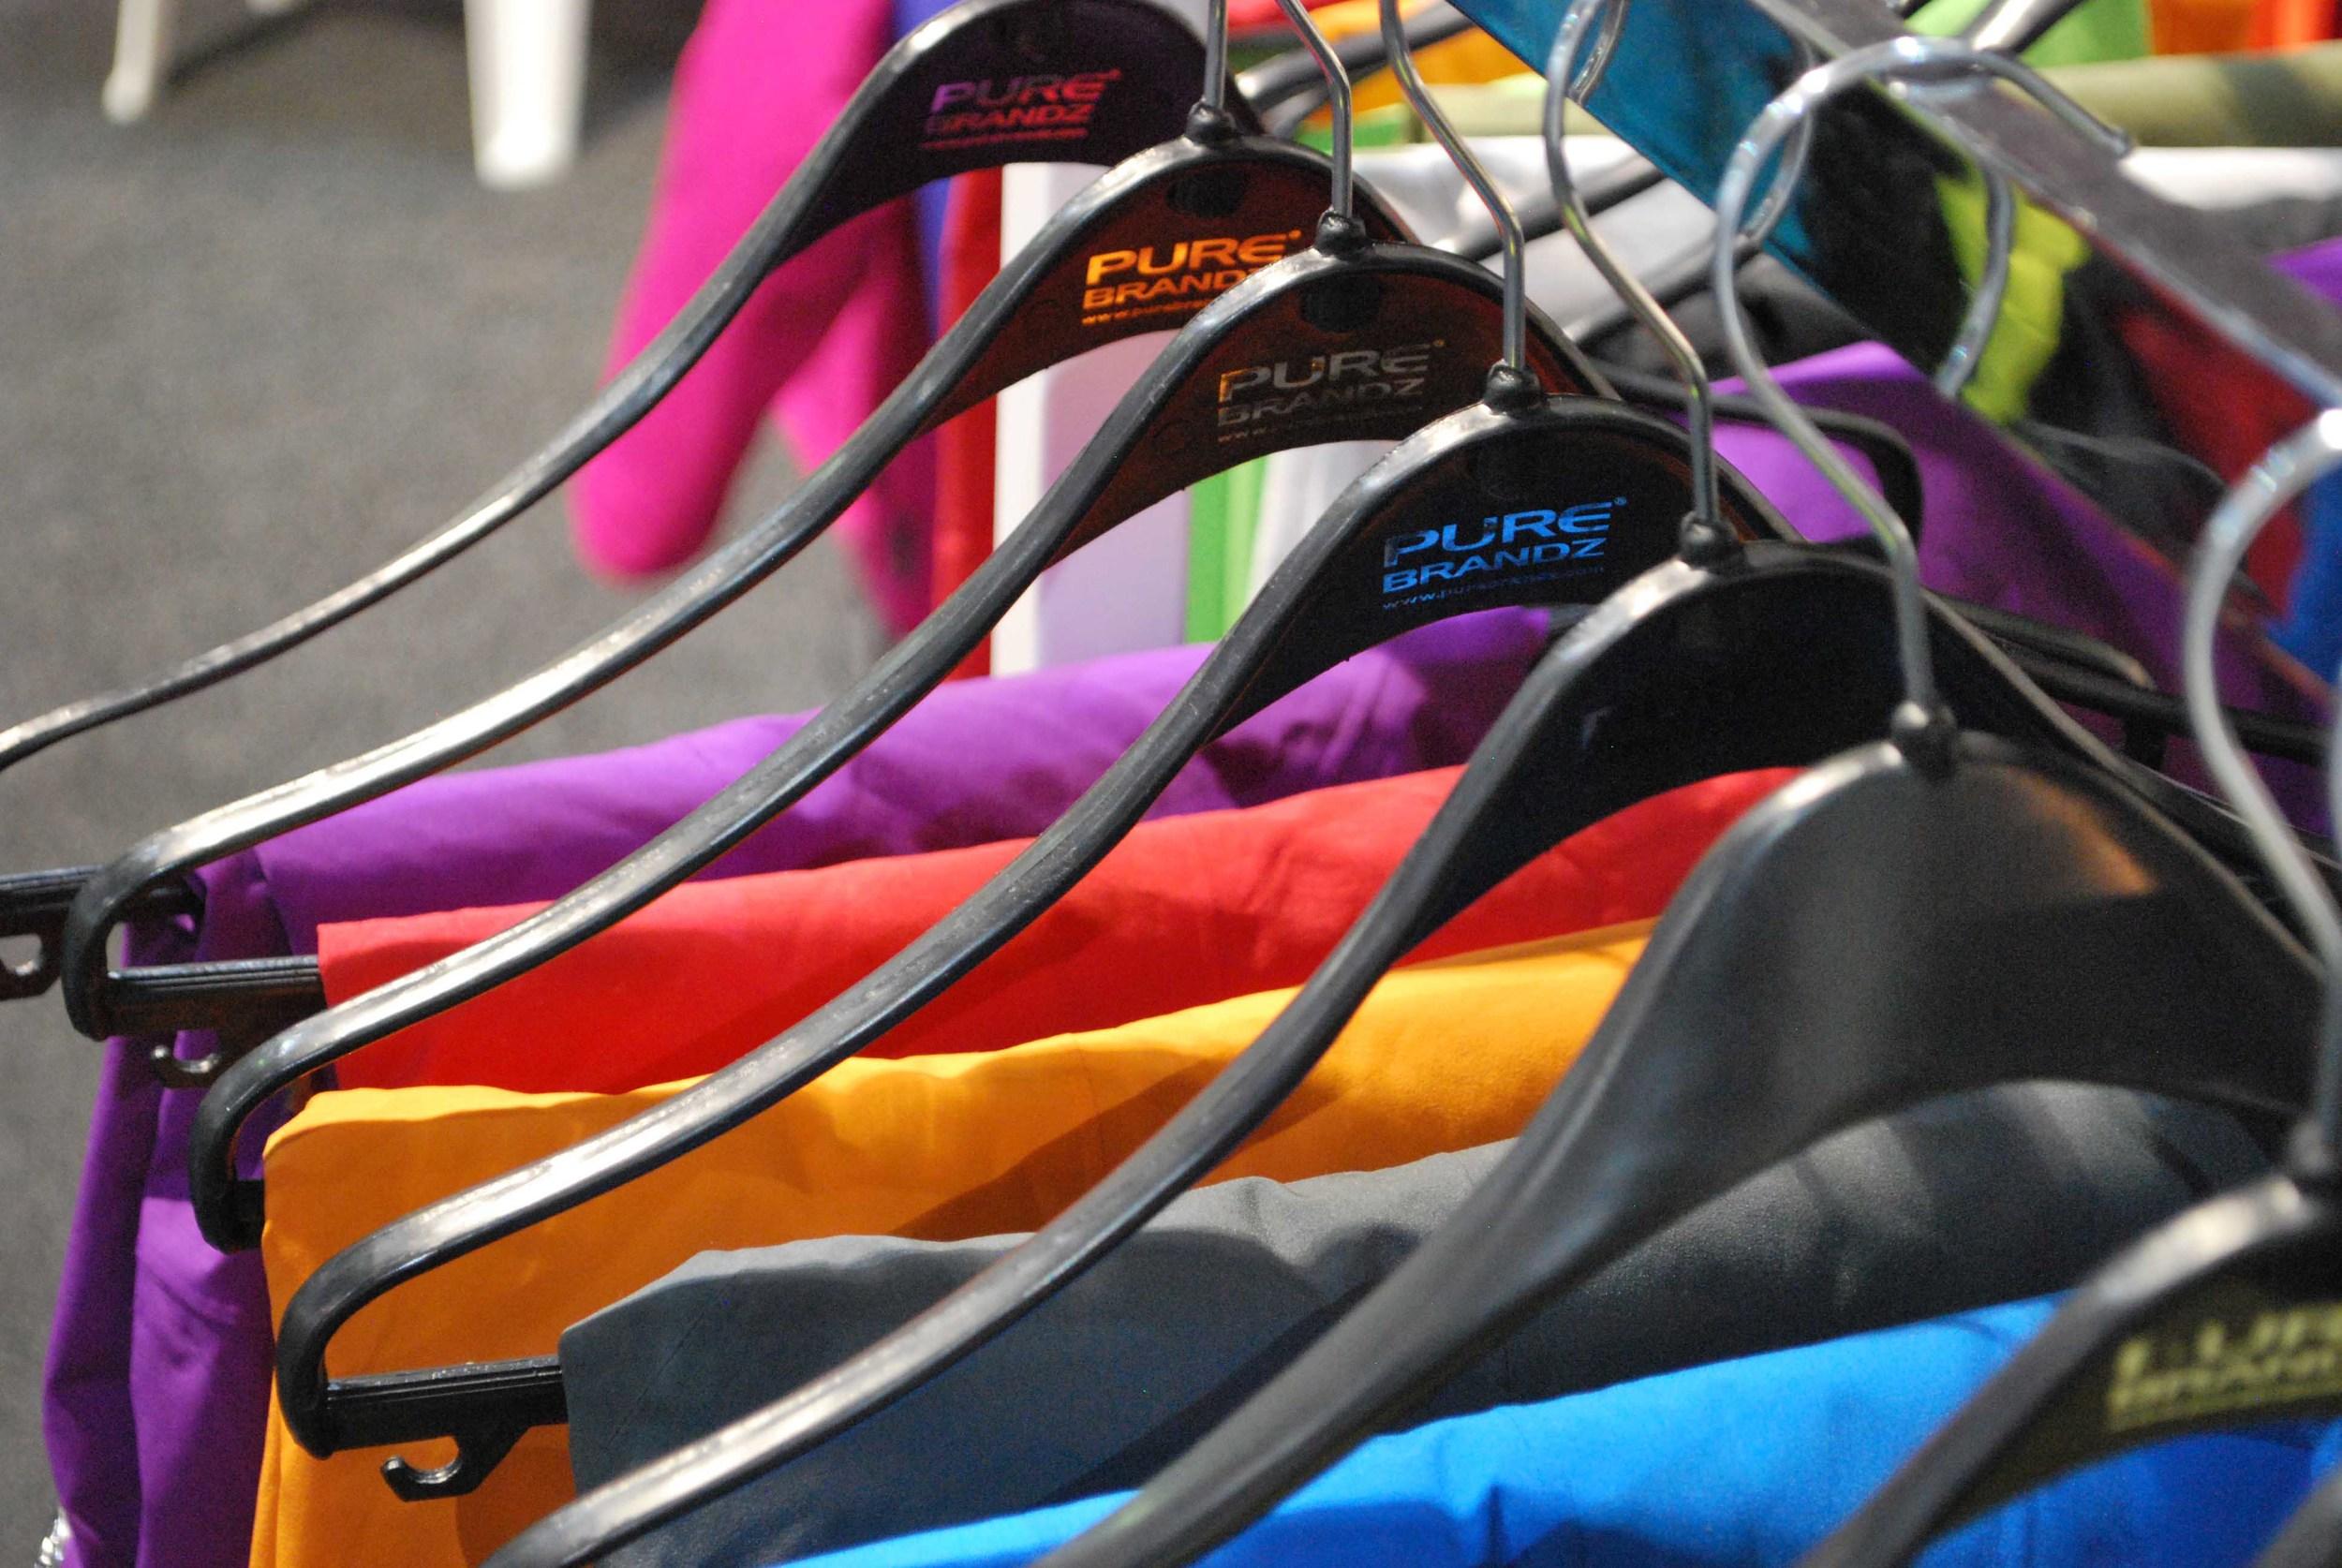 Pure Brandz pant rack